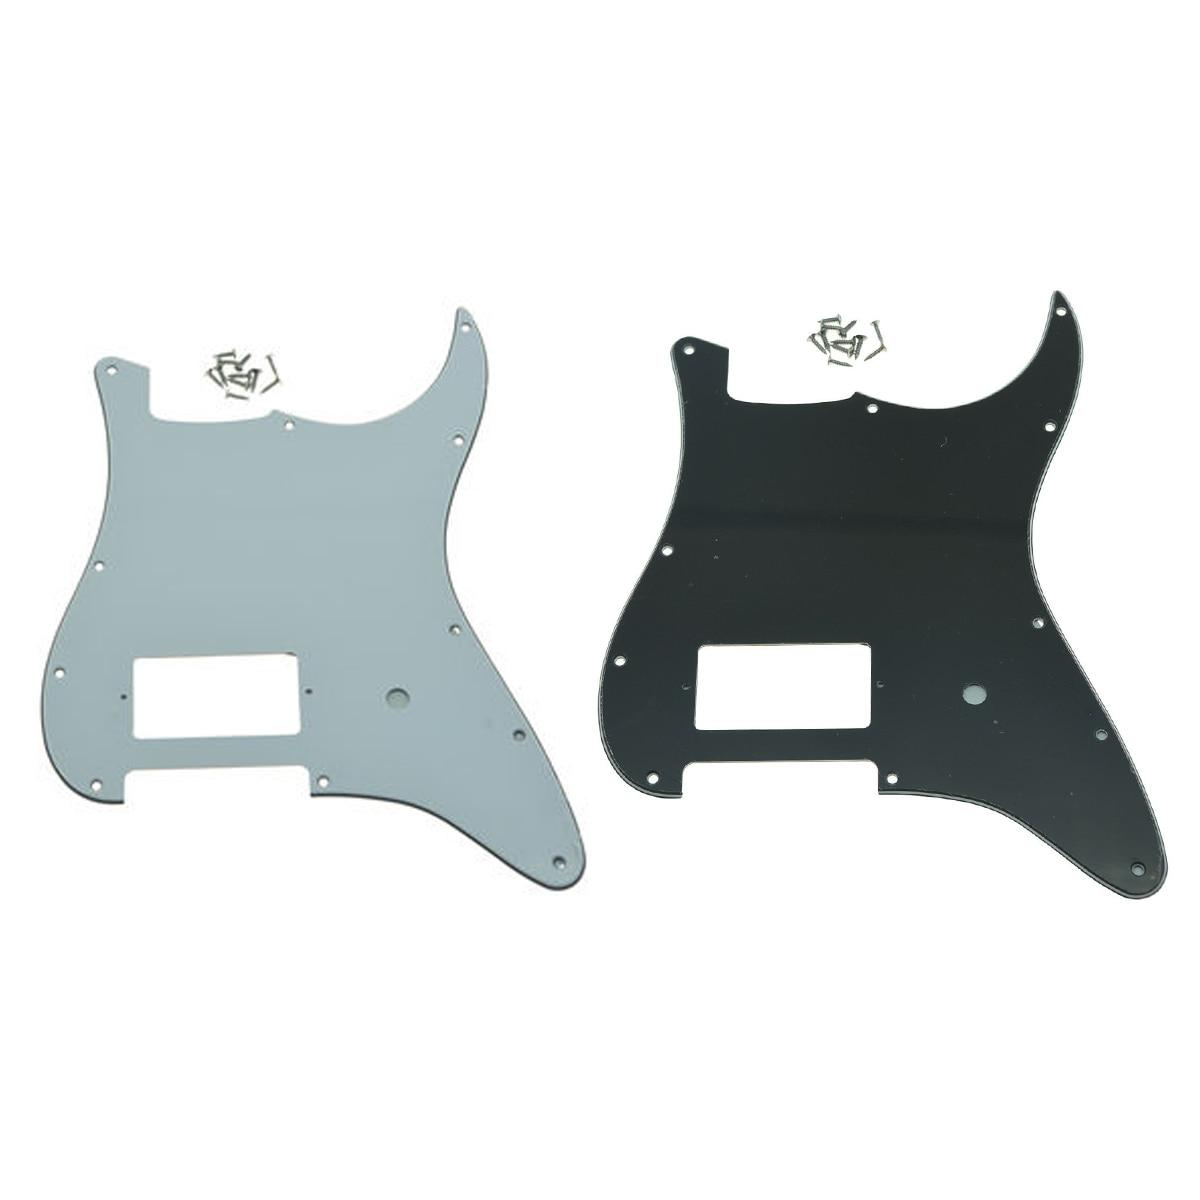 Ohello-golpeador de guitarra ST Strat One Humbucker, placa rascadora compatible con guardabarros...